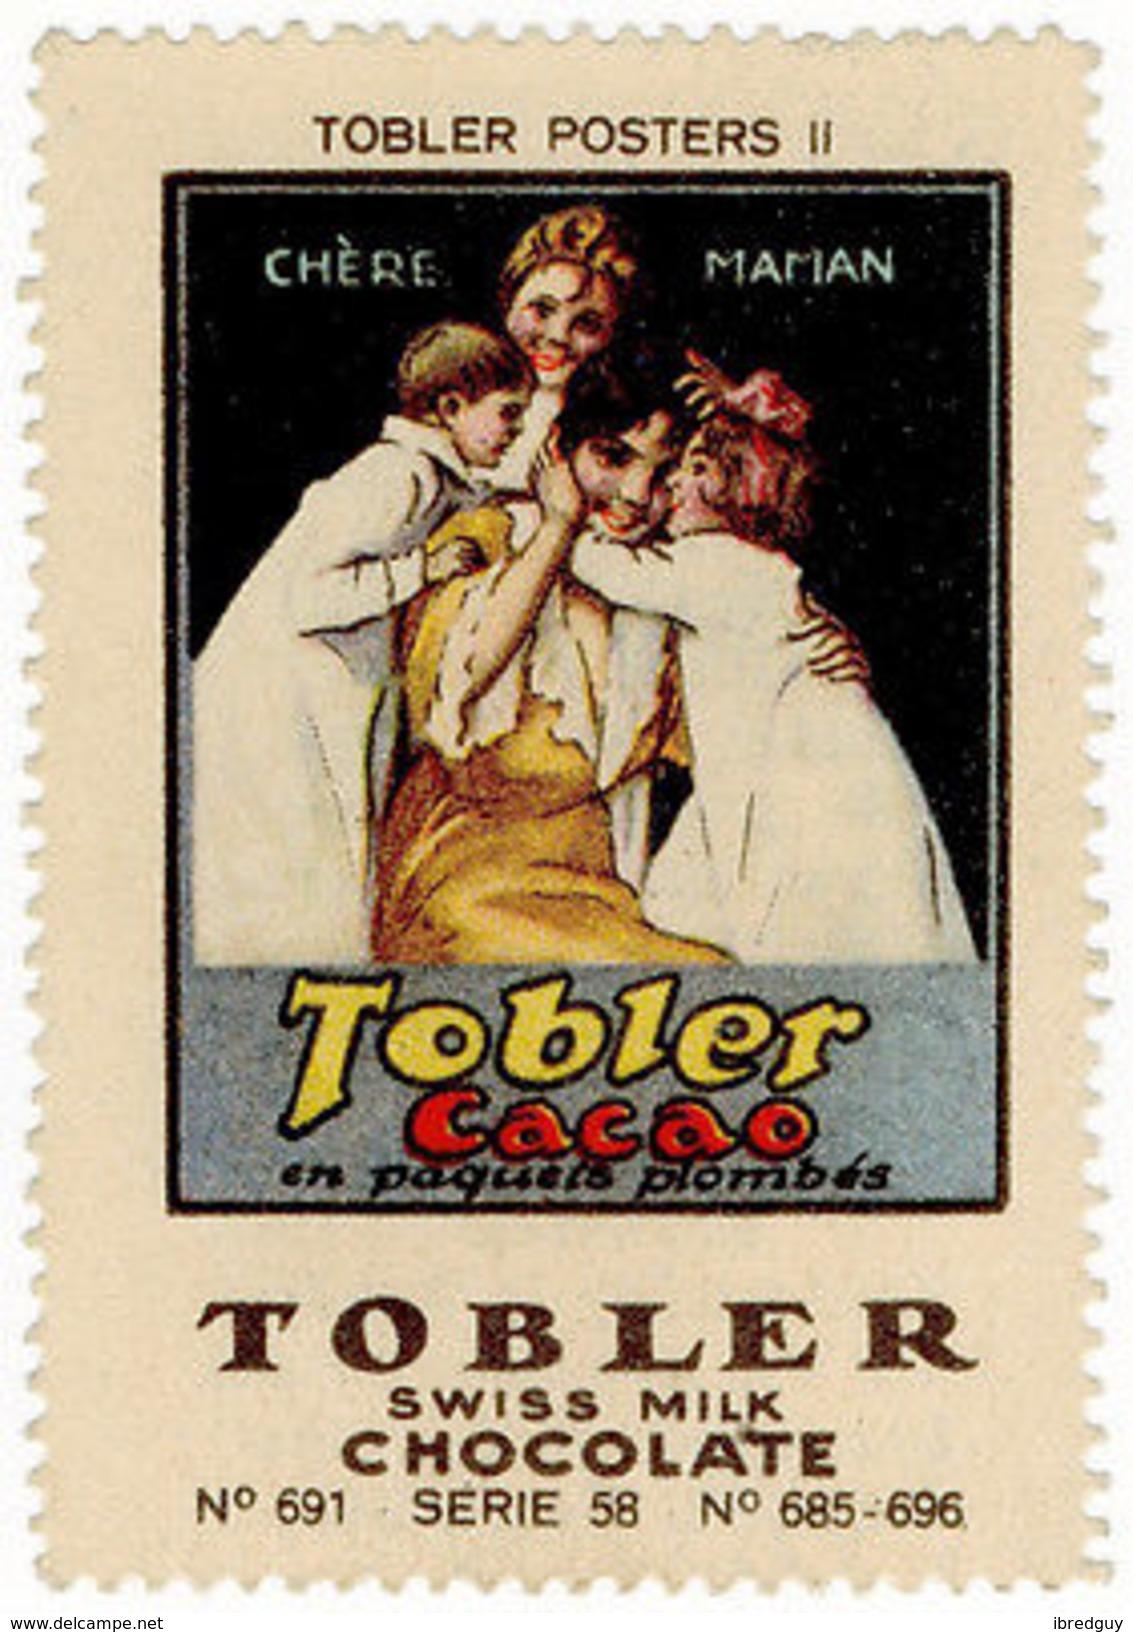 (I.B) Cinderella Collection : Tobler Chocolate Series 58 (Chere Maman) - Switzerland